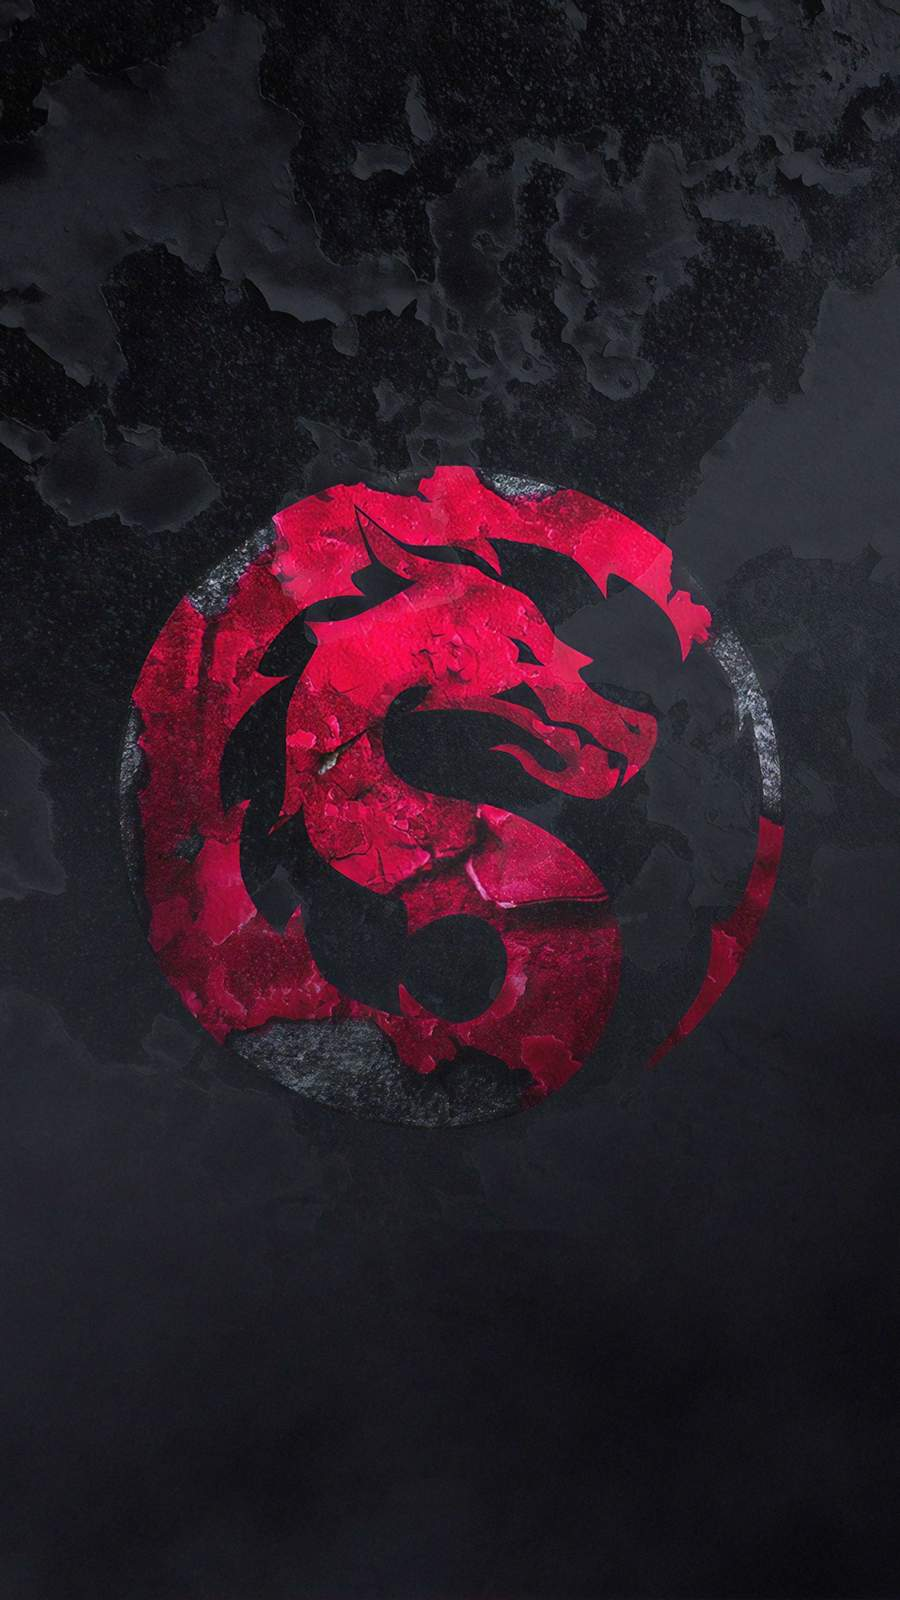 Mortal Kombat Logo iPhone Wallpaper iPhone Wallpaper